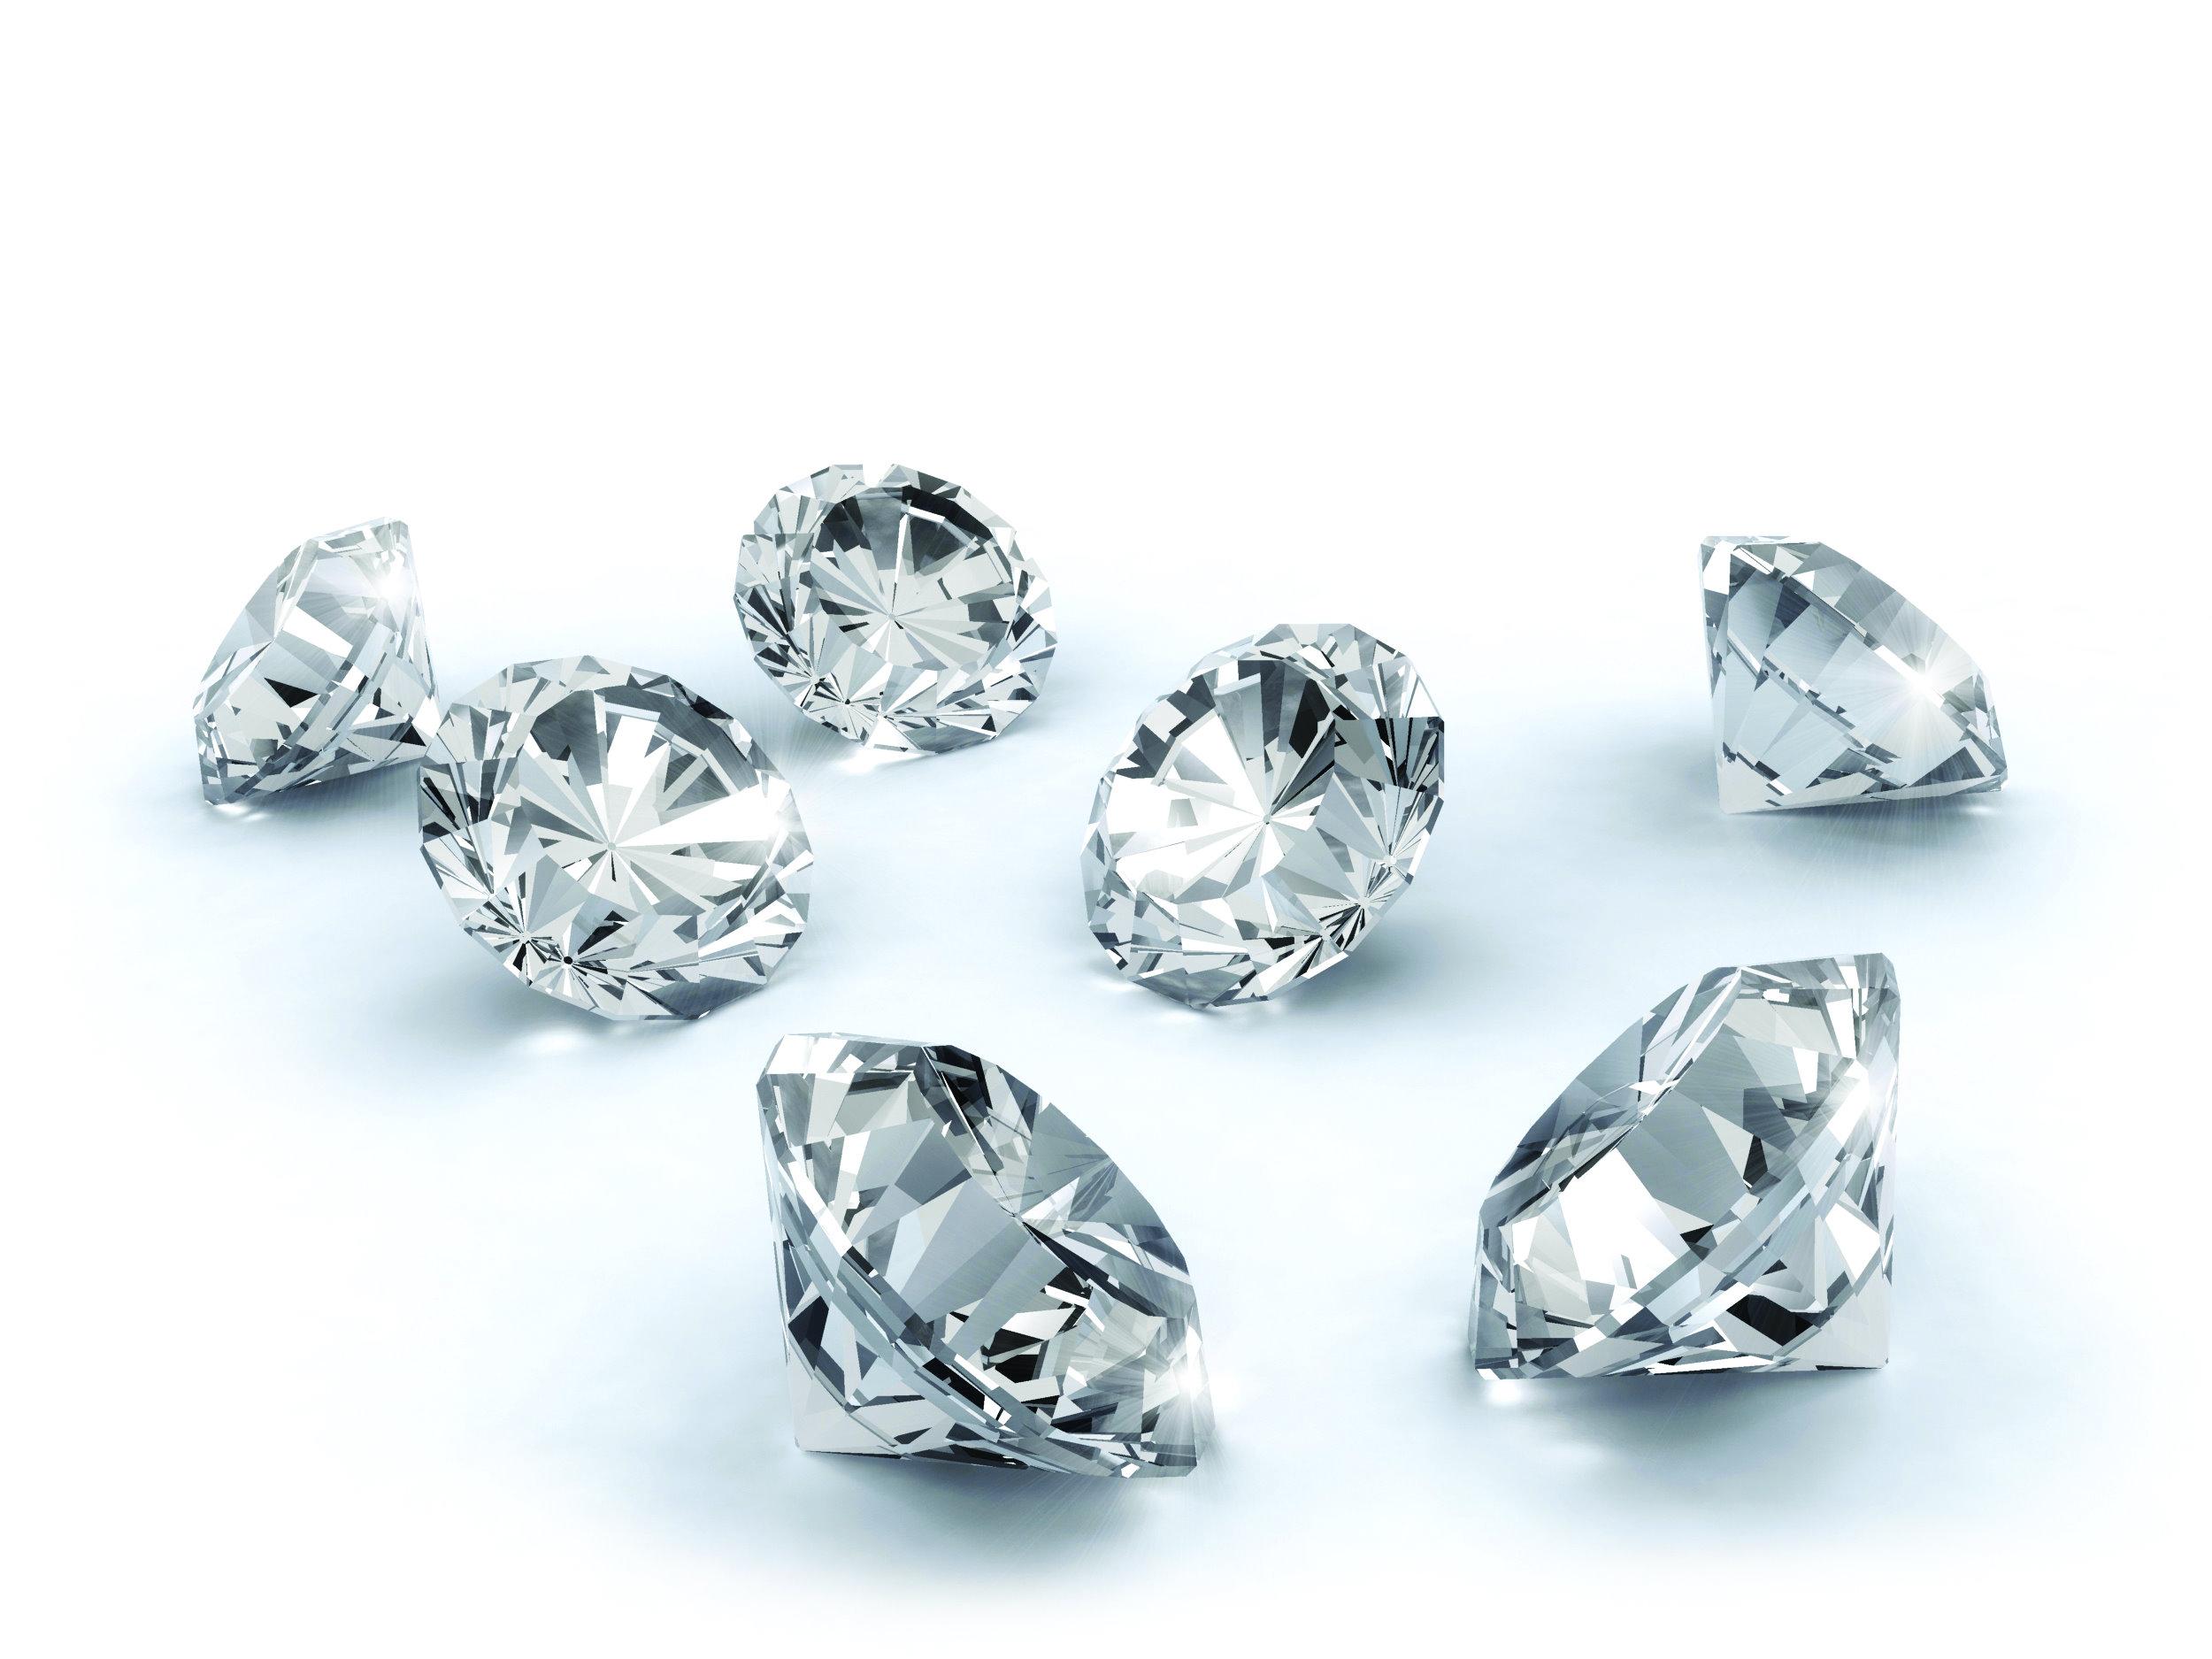 Diamond 2013 High HD Wallpaper 2500x1875